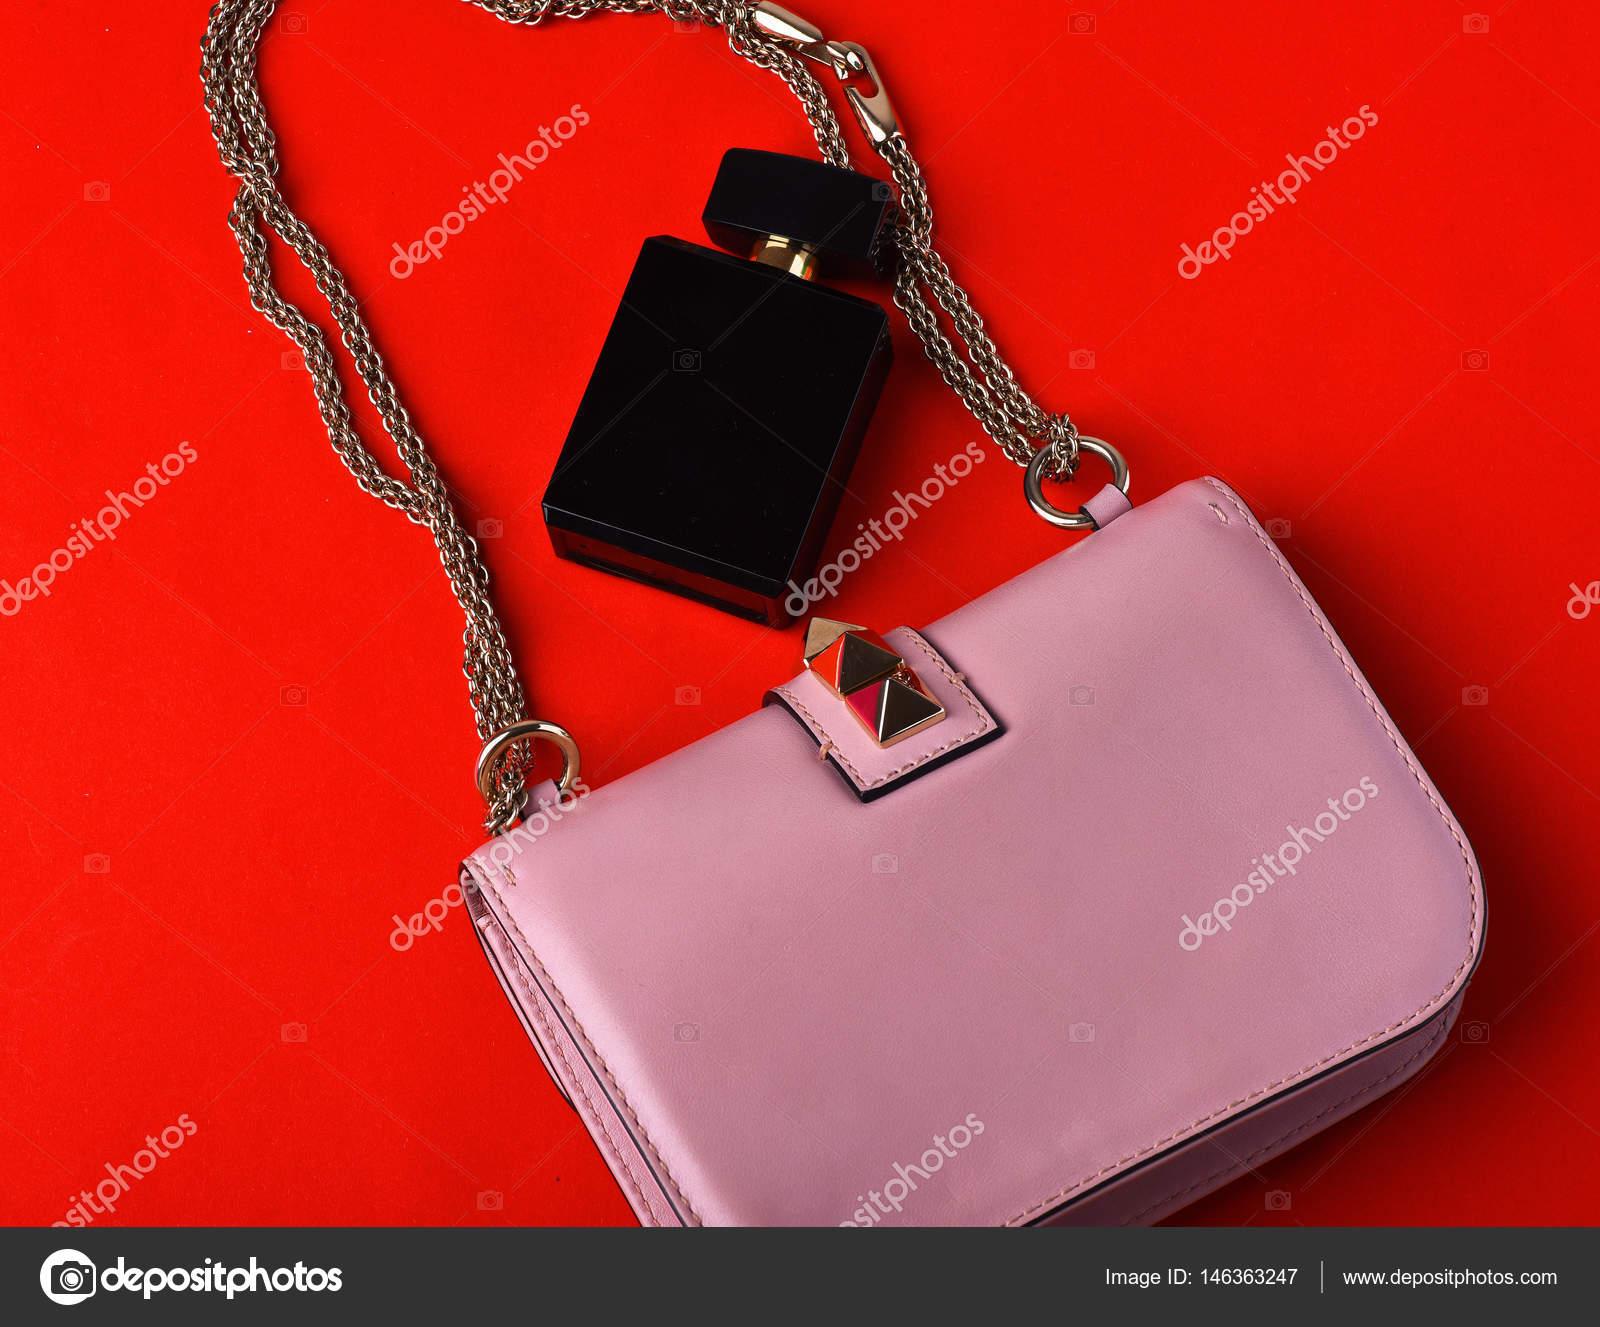 9db4bad044ddcd Leuke mooie kleine dames lederen roze modieuze tas met decoratieve metalen  spikes